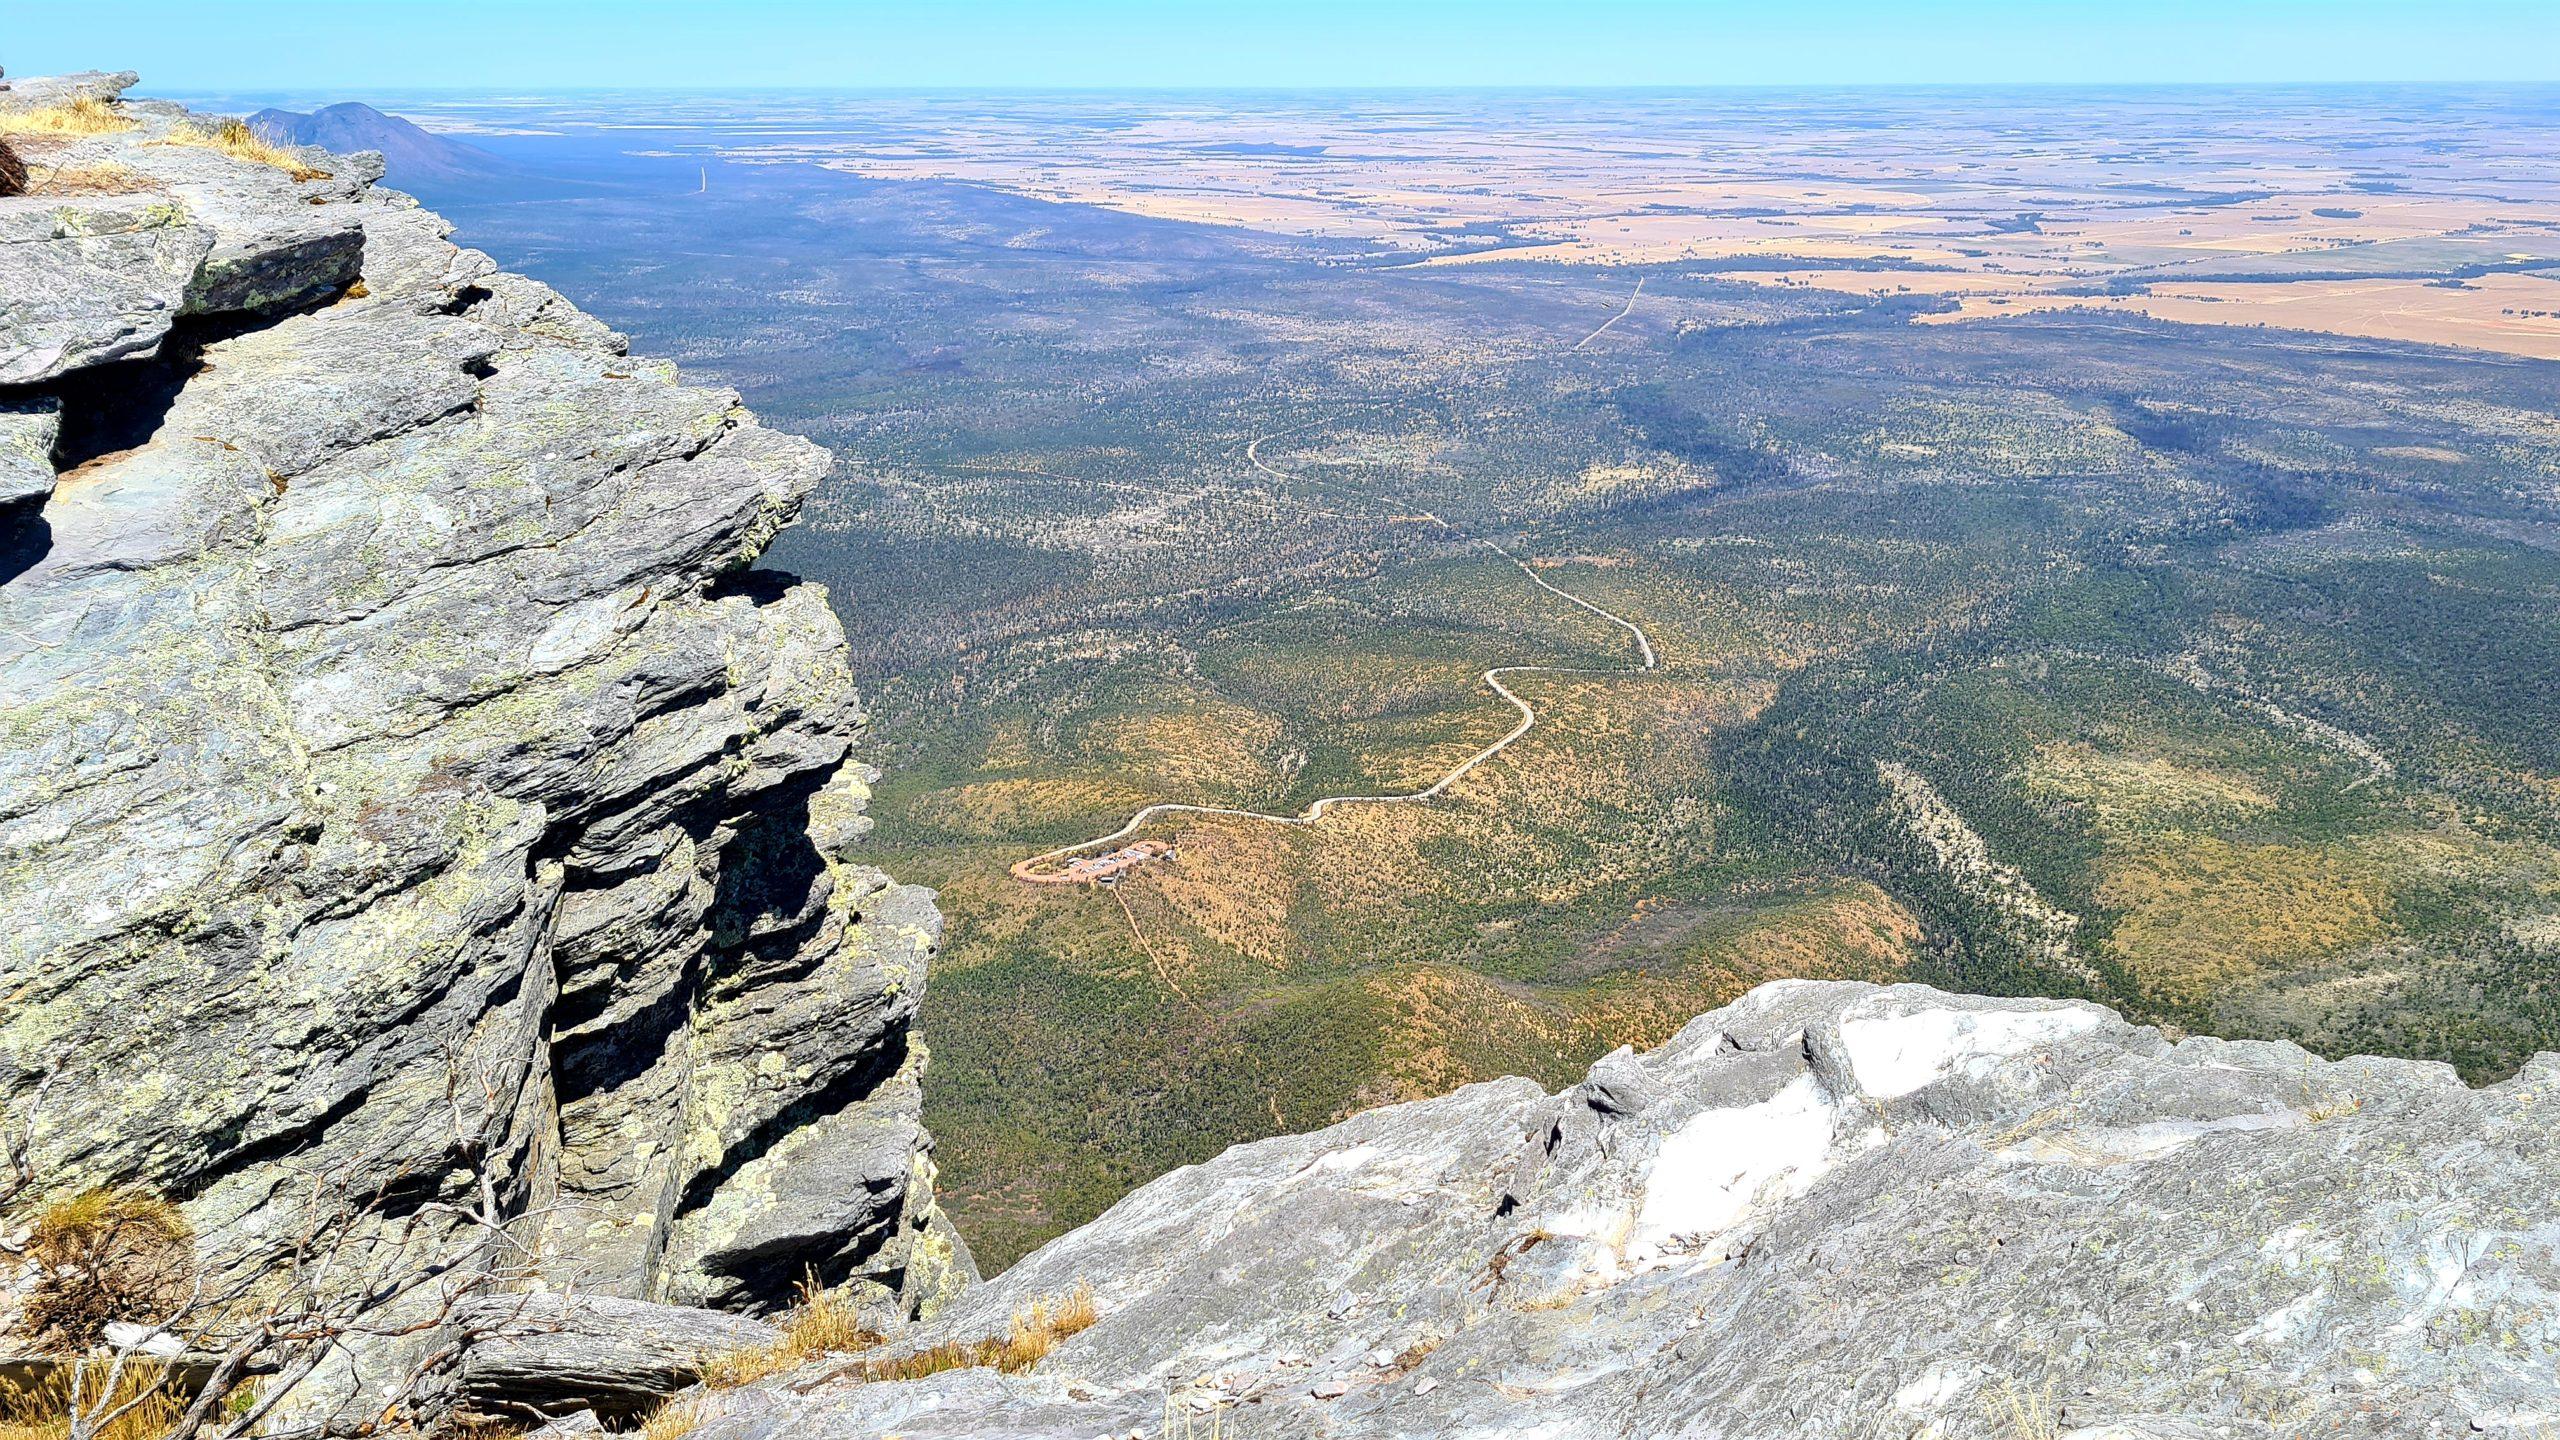 Park Narodowy Stirling Range Bluff Knoll